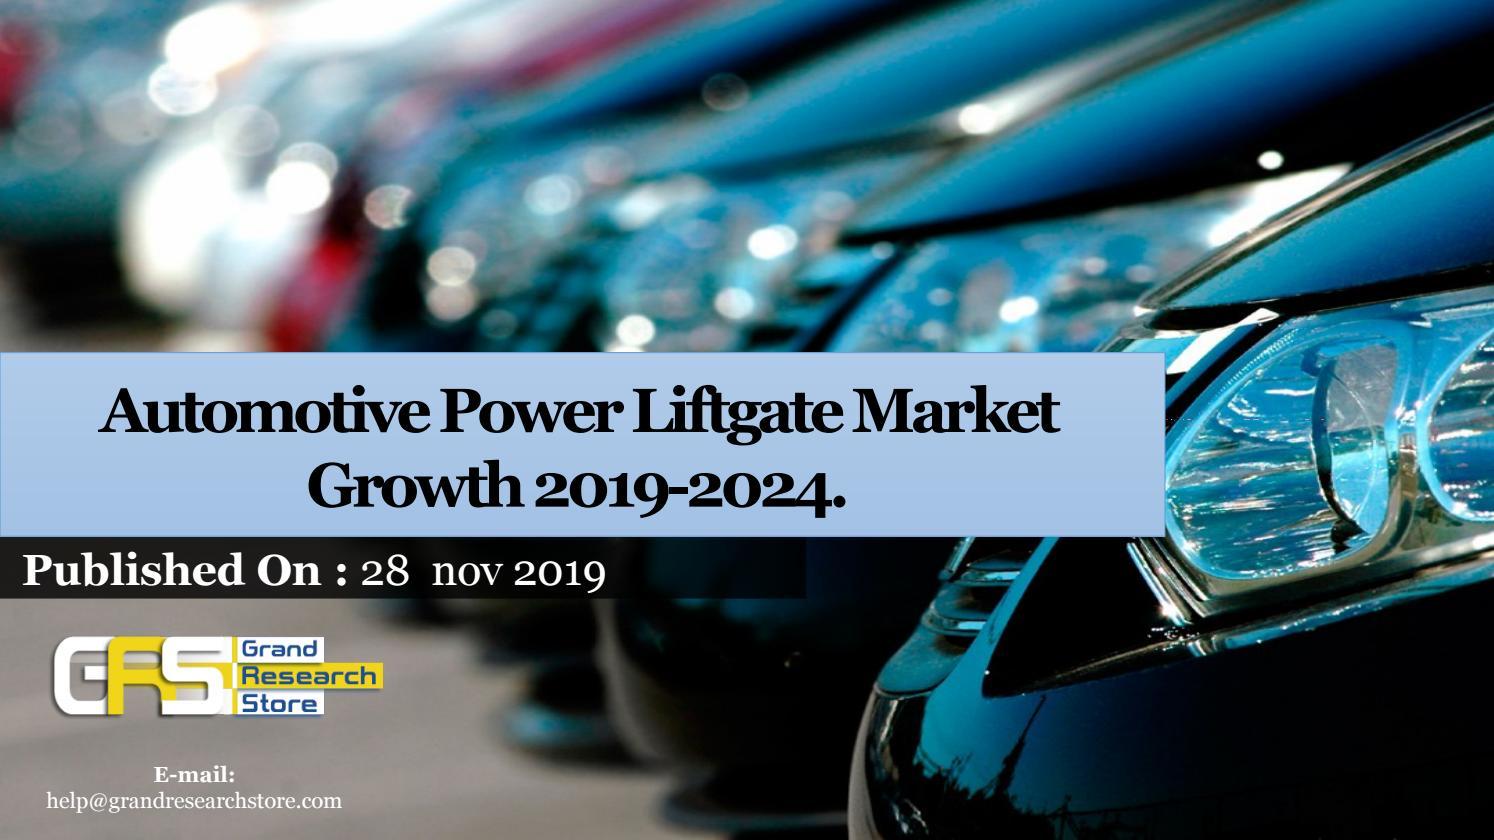 Automotive Power Liftgate Market Growth 2019 2024 By Dhirufarkade28 Issuu